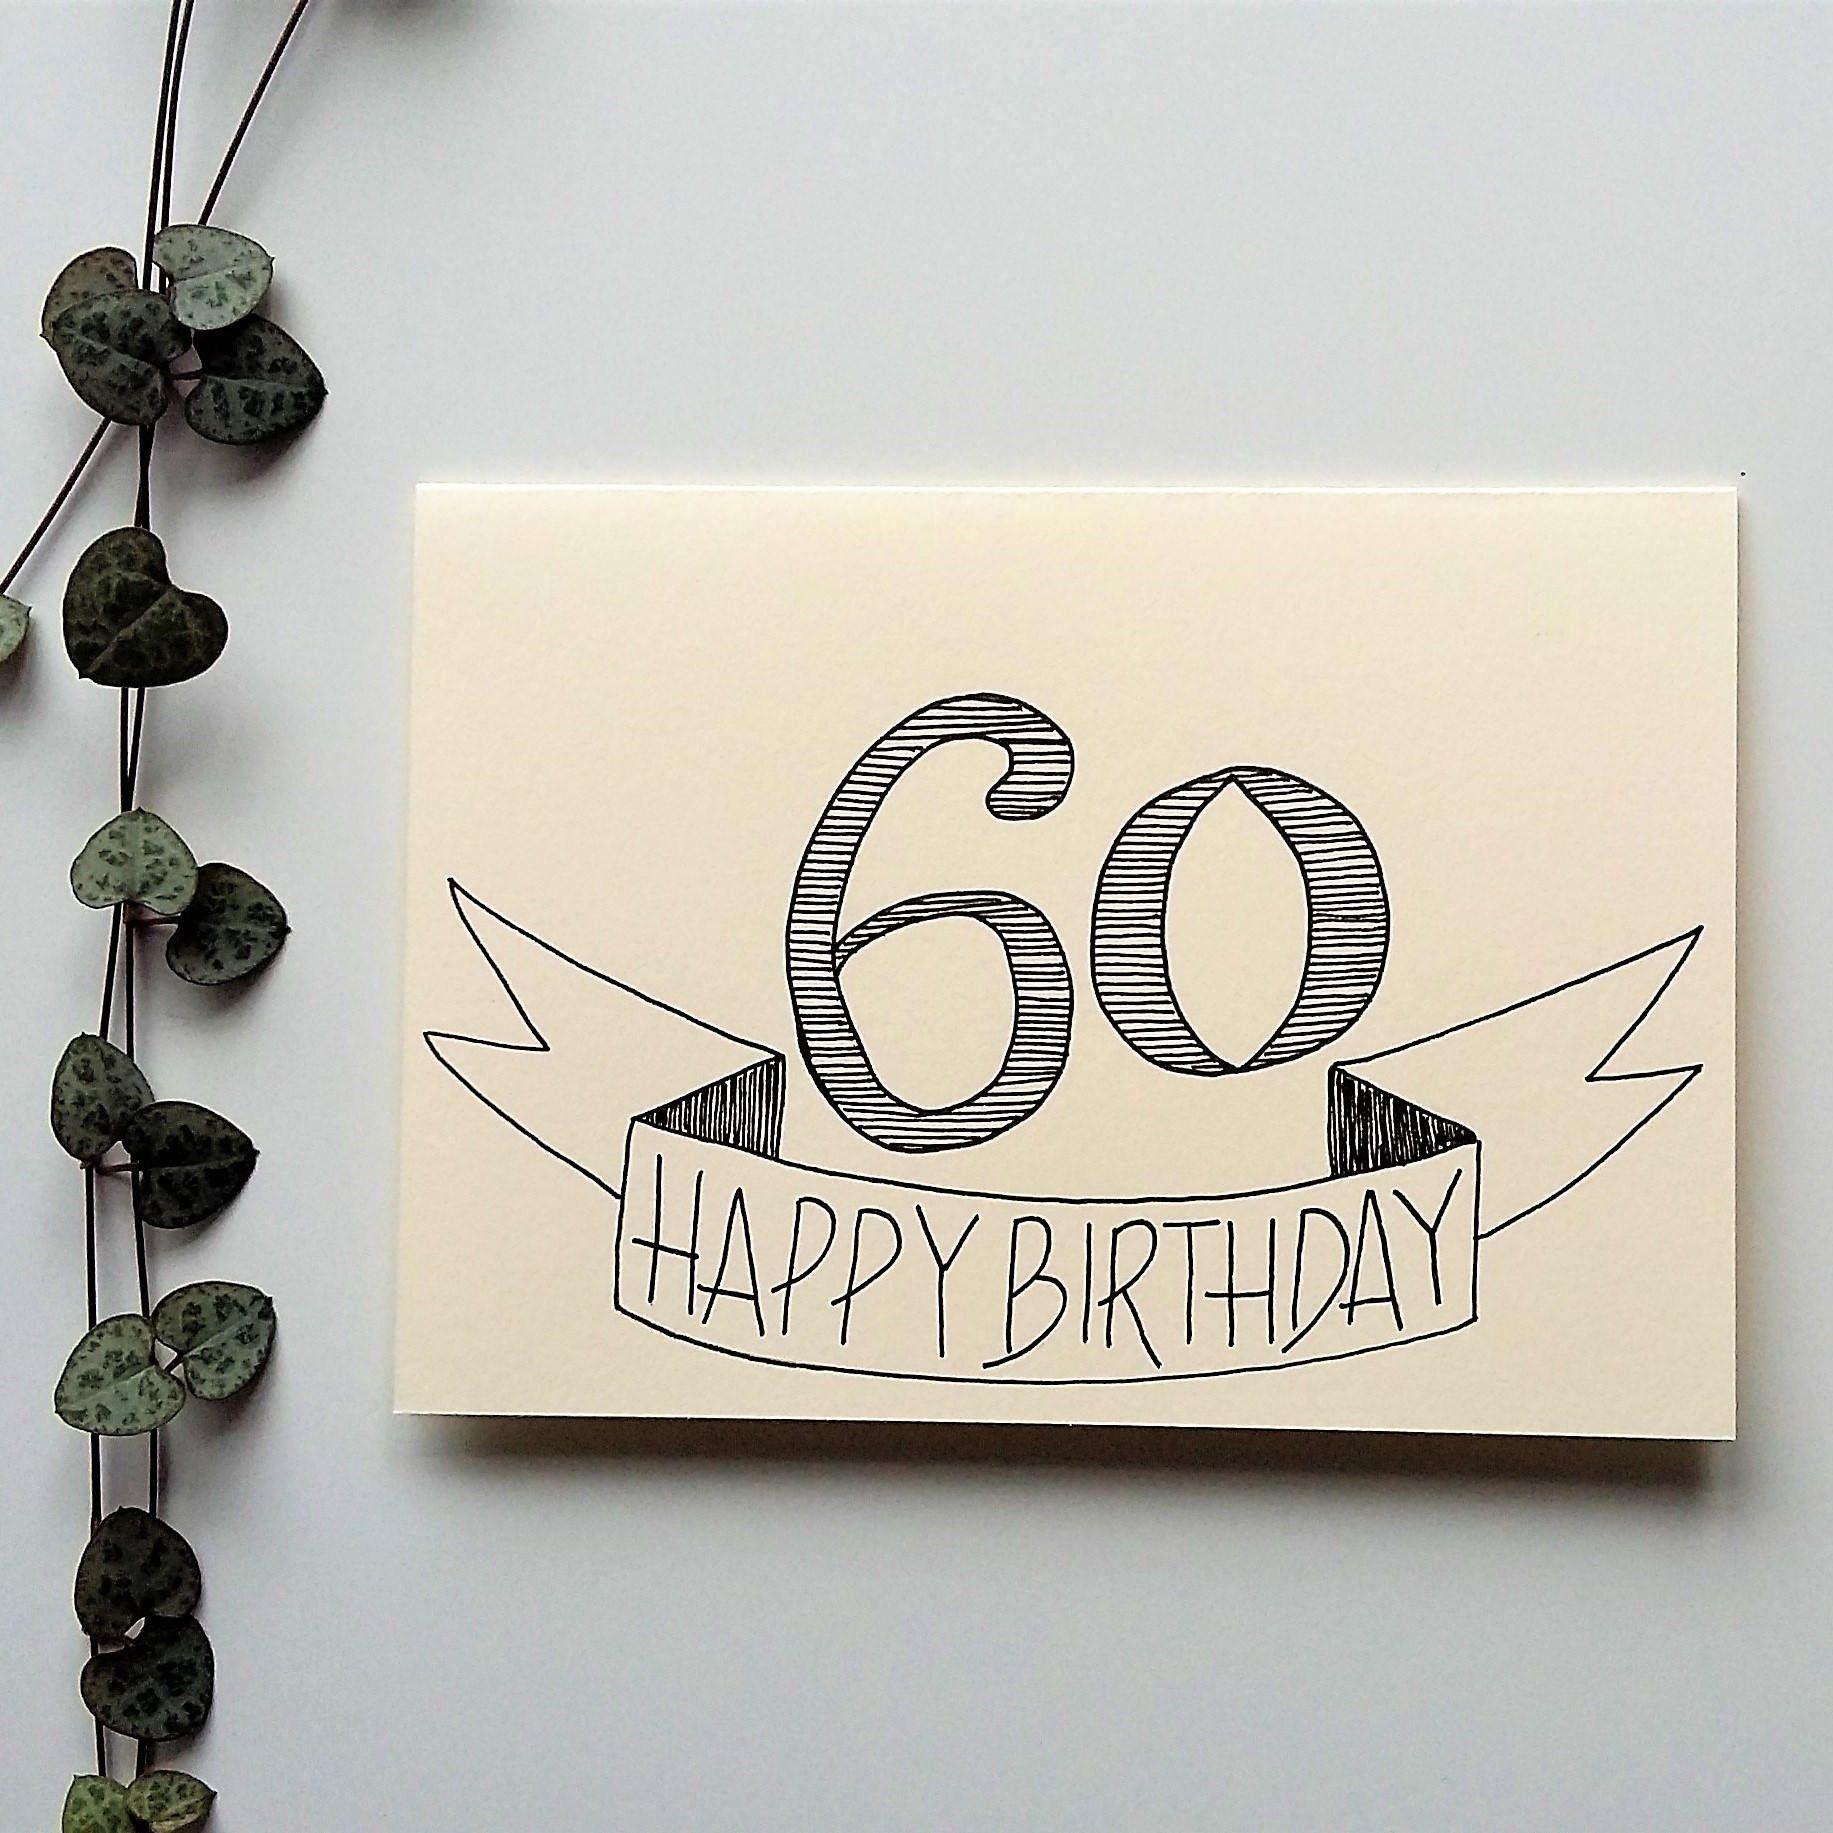 60th Birthday Card A6 Hand Drawn Birthday Card Handmade Hand Drawn Cards By Beck S Creative Made O Birthday Card Drawing 60th Birthday Cards Birthday Cards